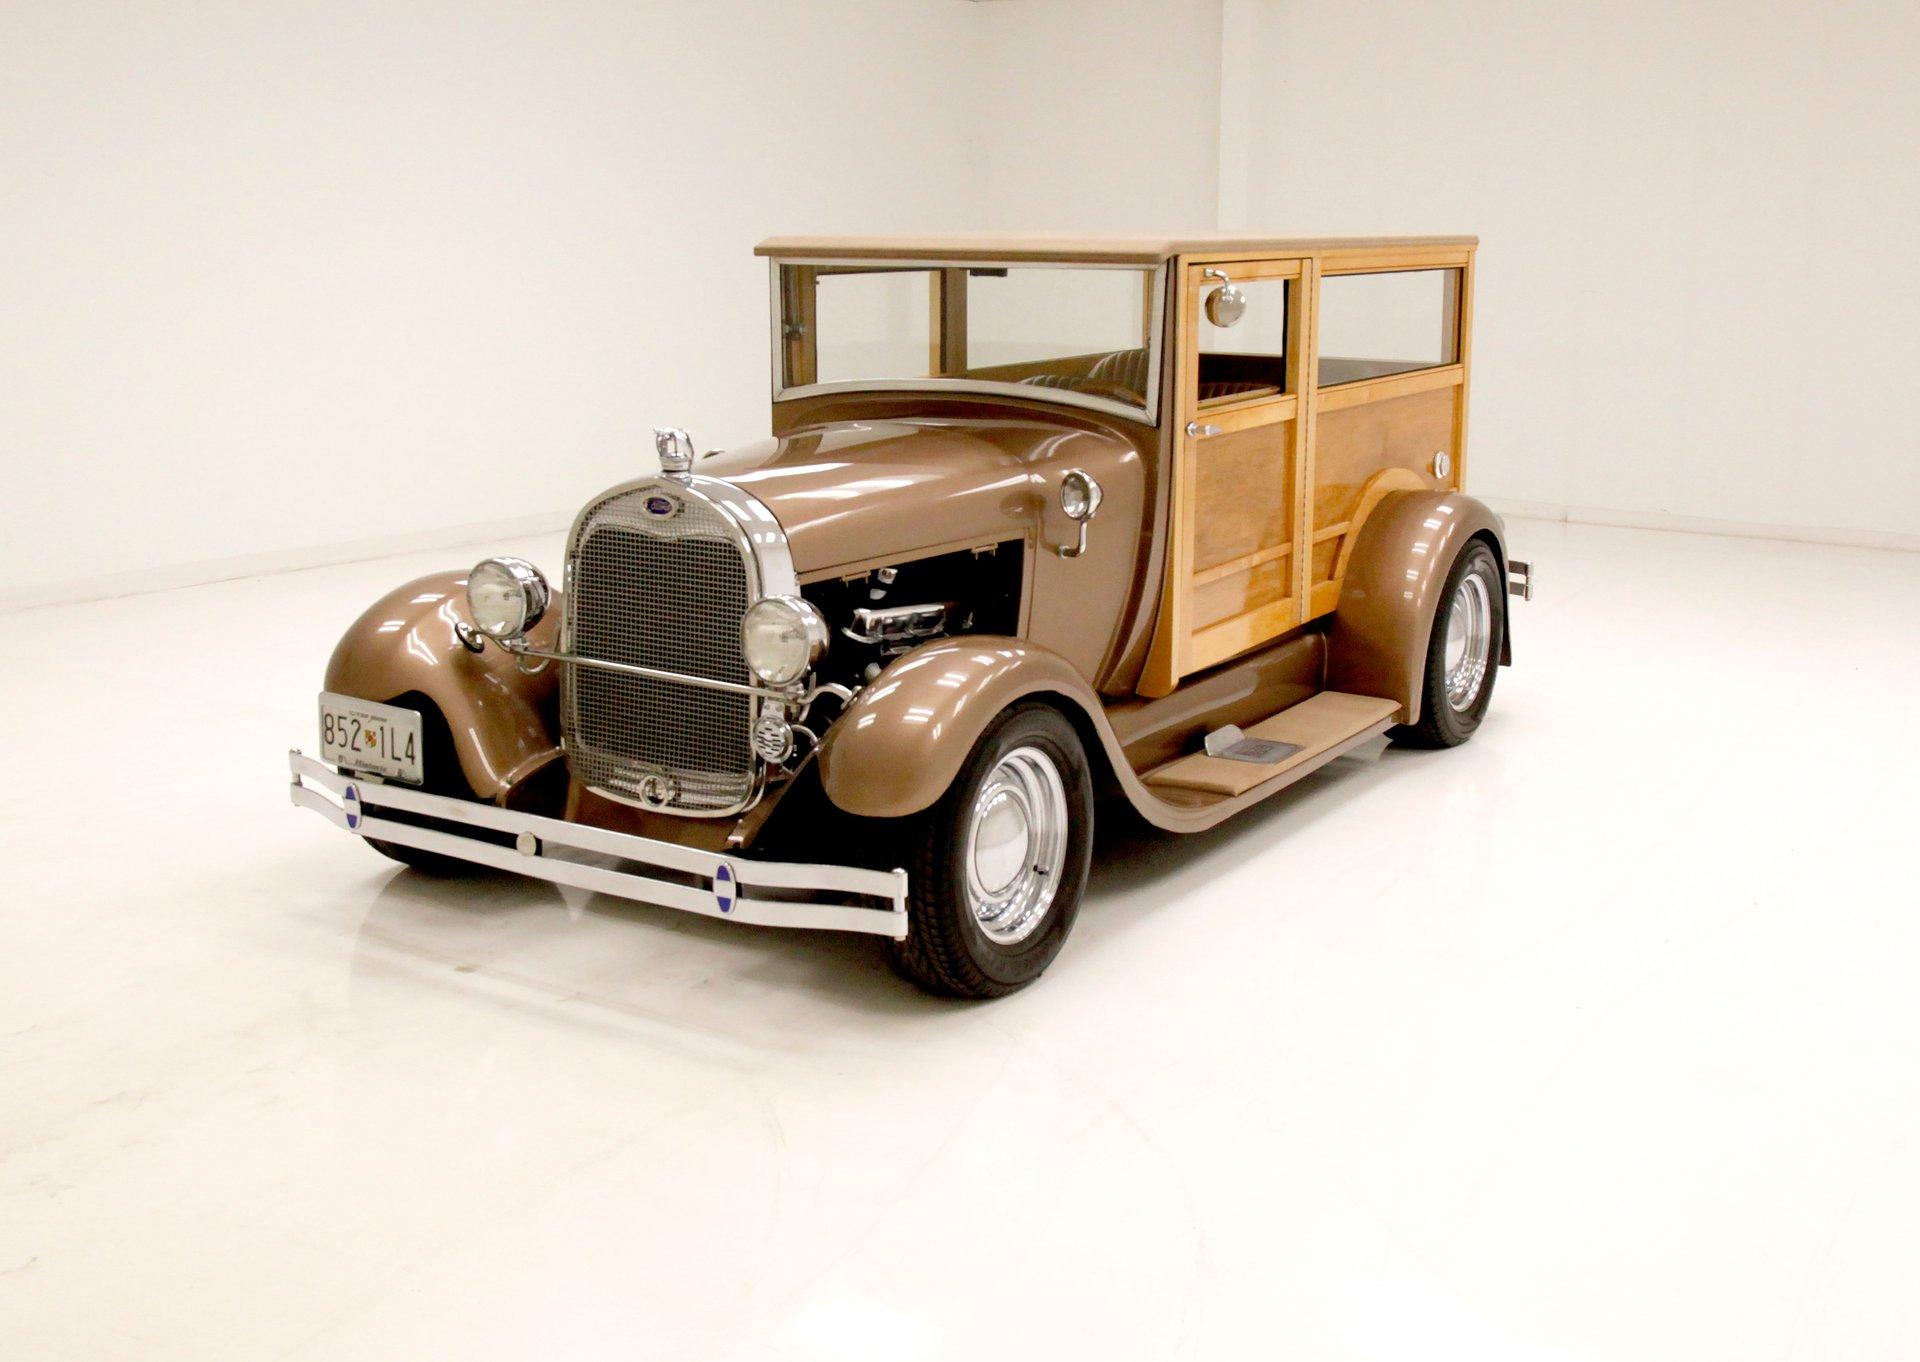 1929 Ford Phantom Woody